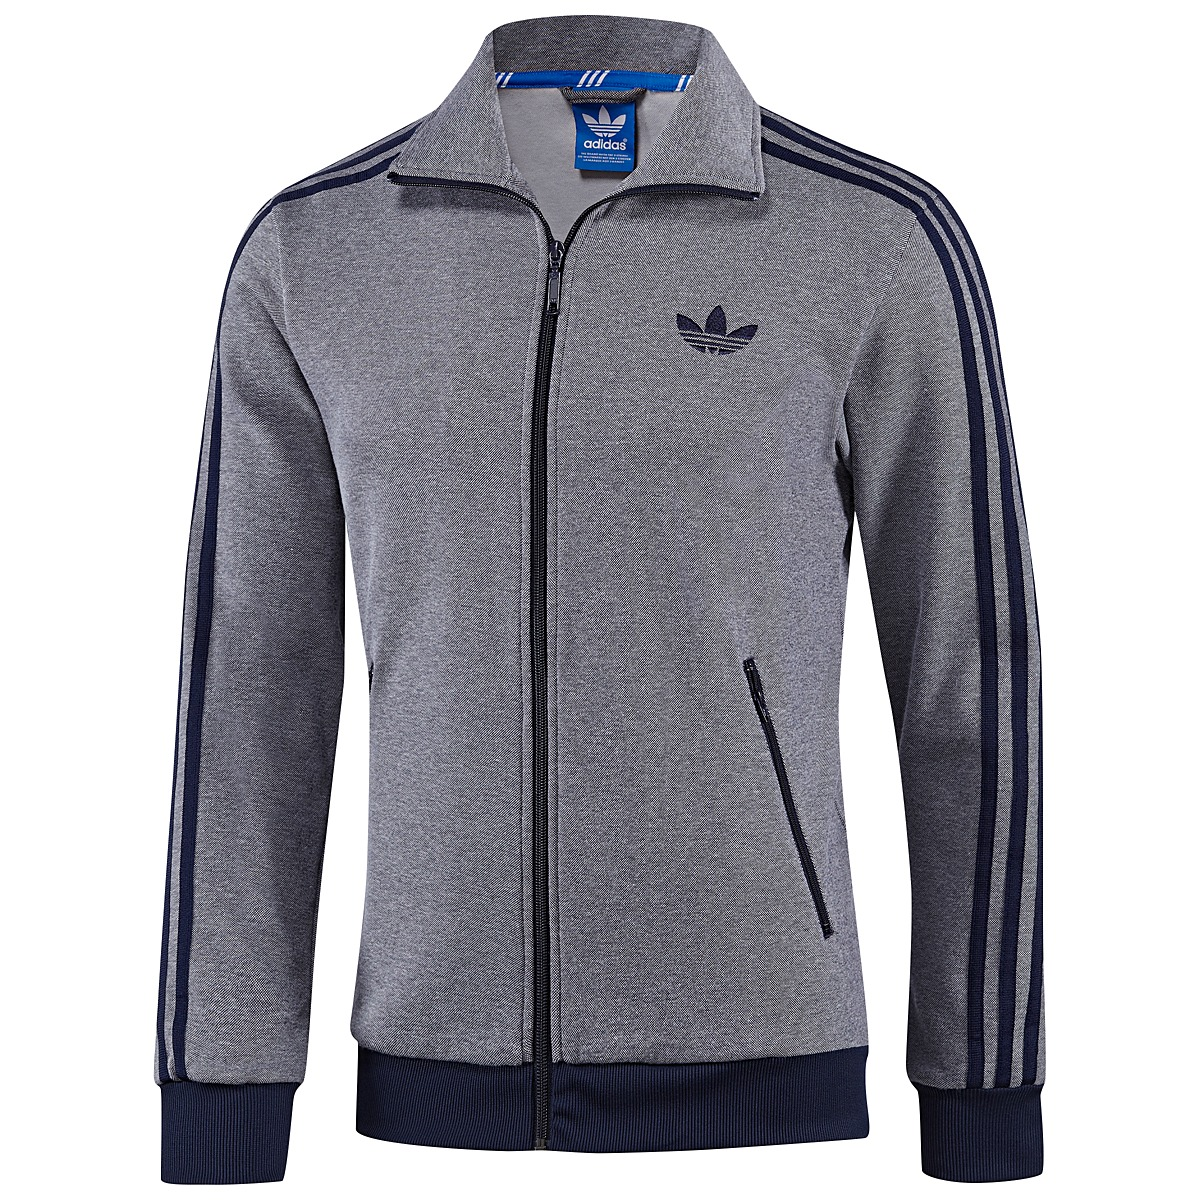 adidas originals firebird tt herren jacke trainingsjacke track top blau grau ebay. Black Bedroom Furniture Sets. Home Design Ideas